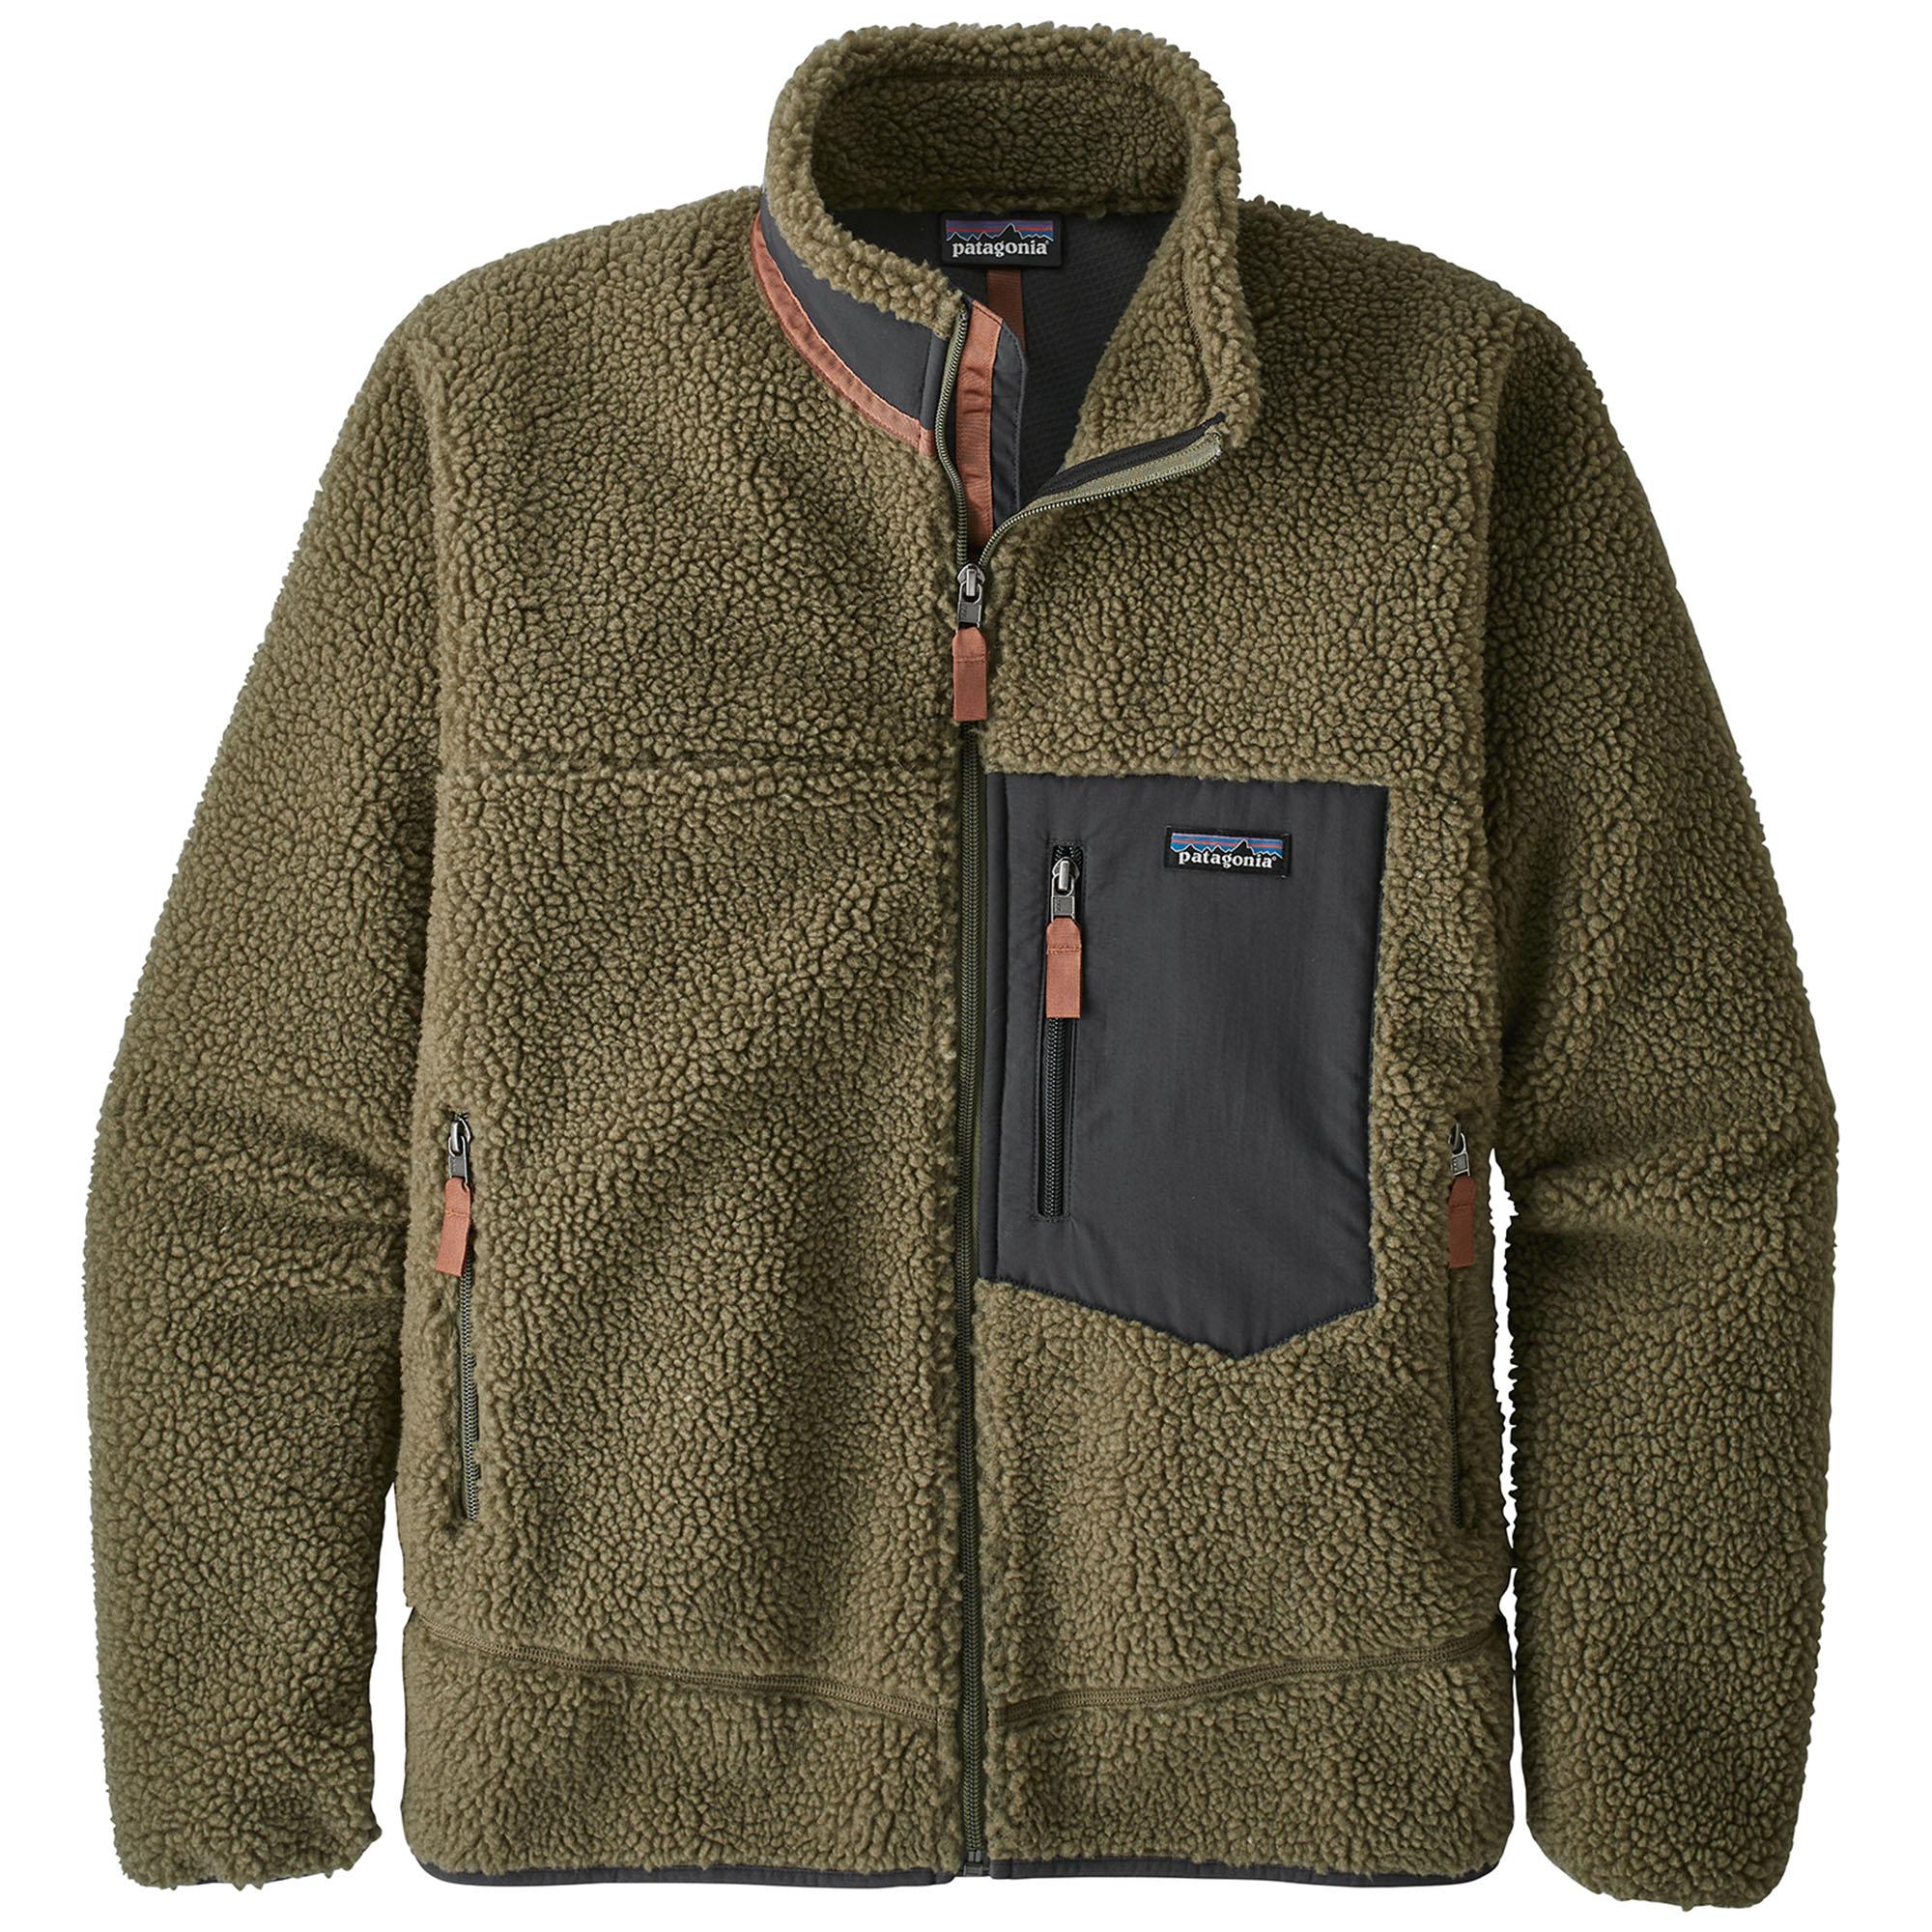 Patagonia Men's Classic Retro X® Fleece Jacket